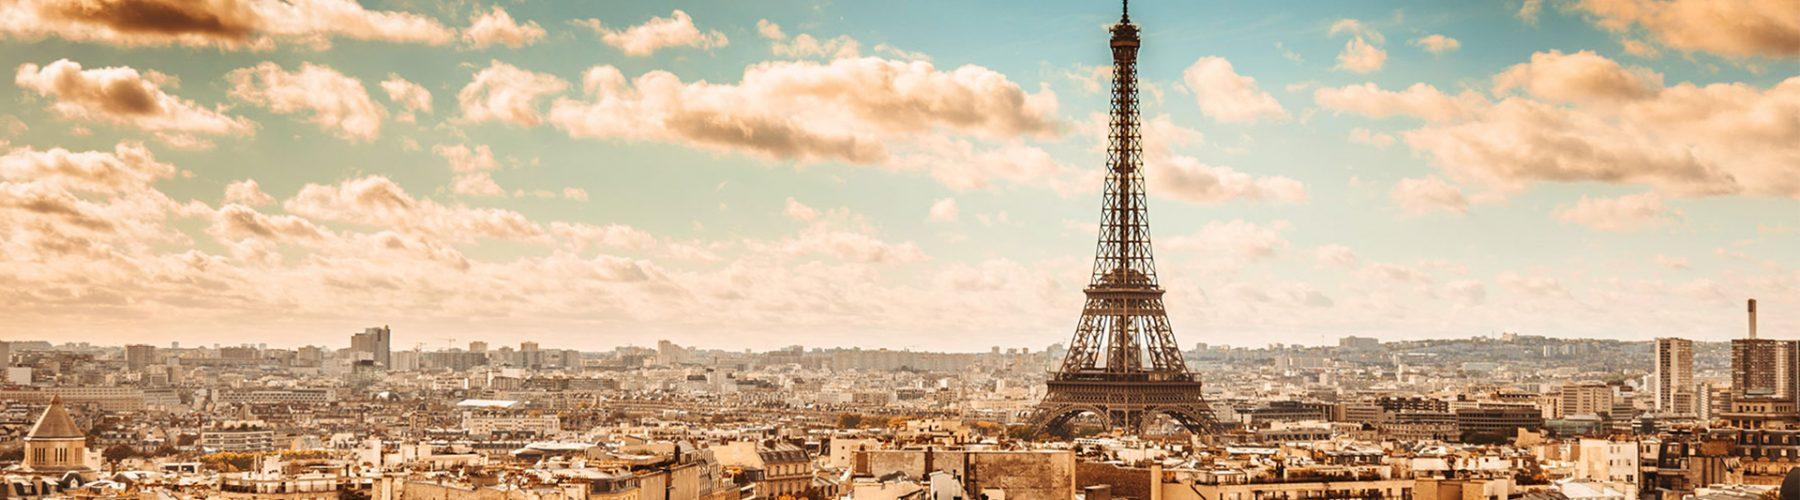 ver París